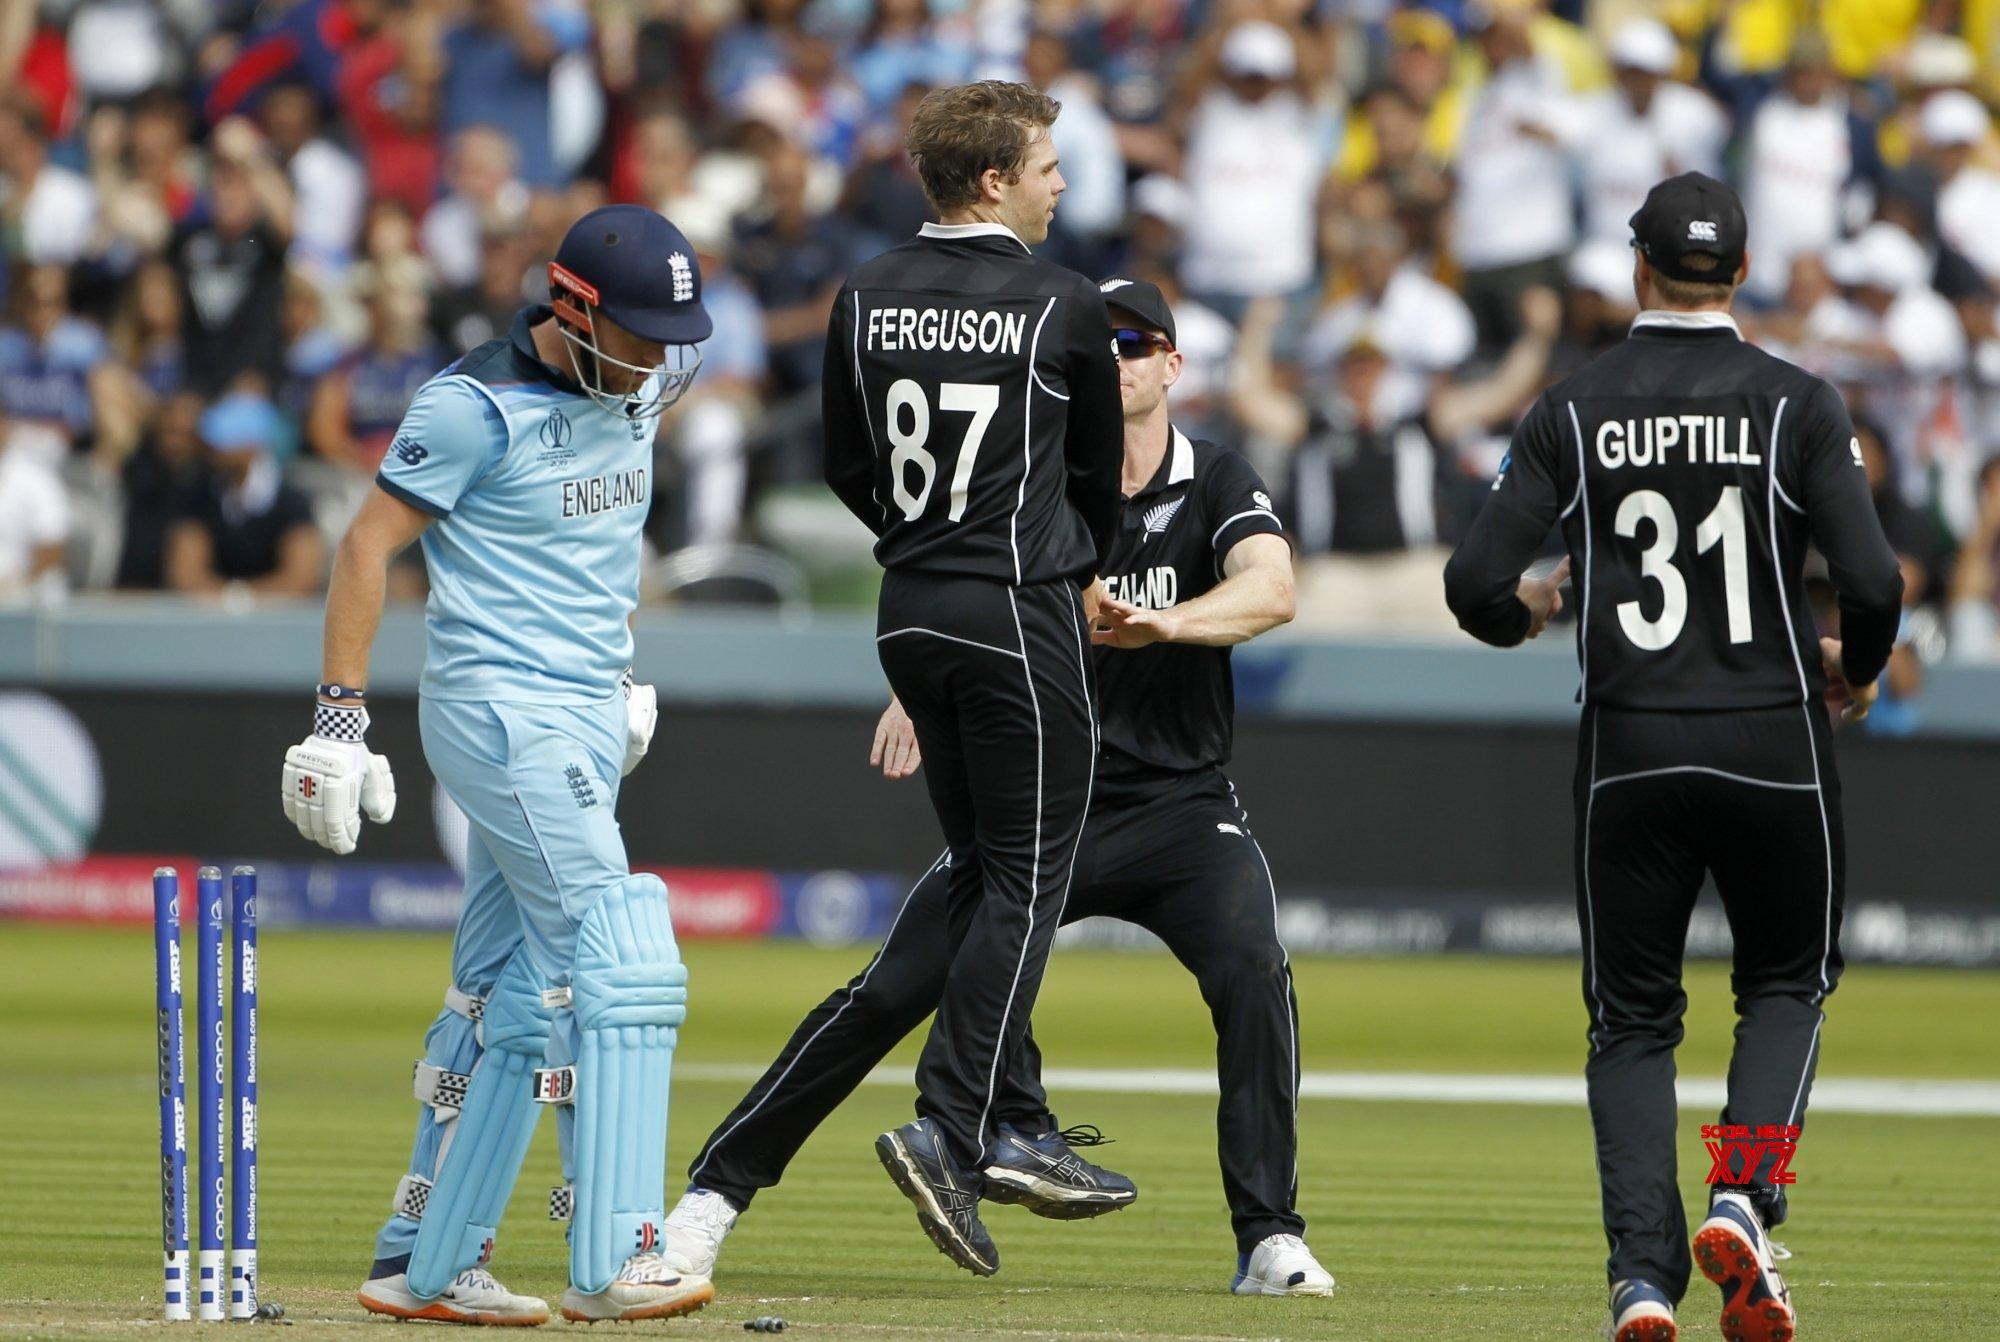 London (England): 2019 World Cup - Final - New Zealand Vs England (Batch - 37) #Gallery